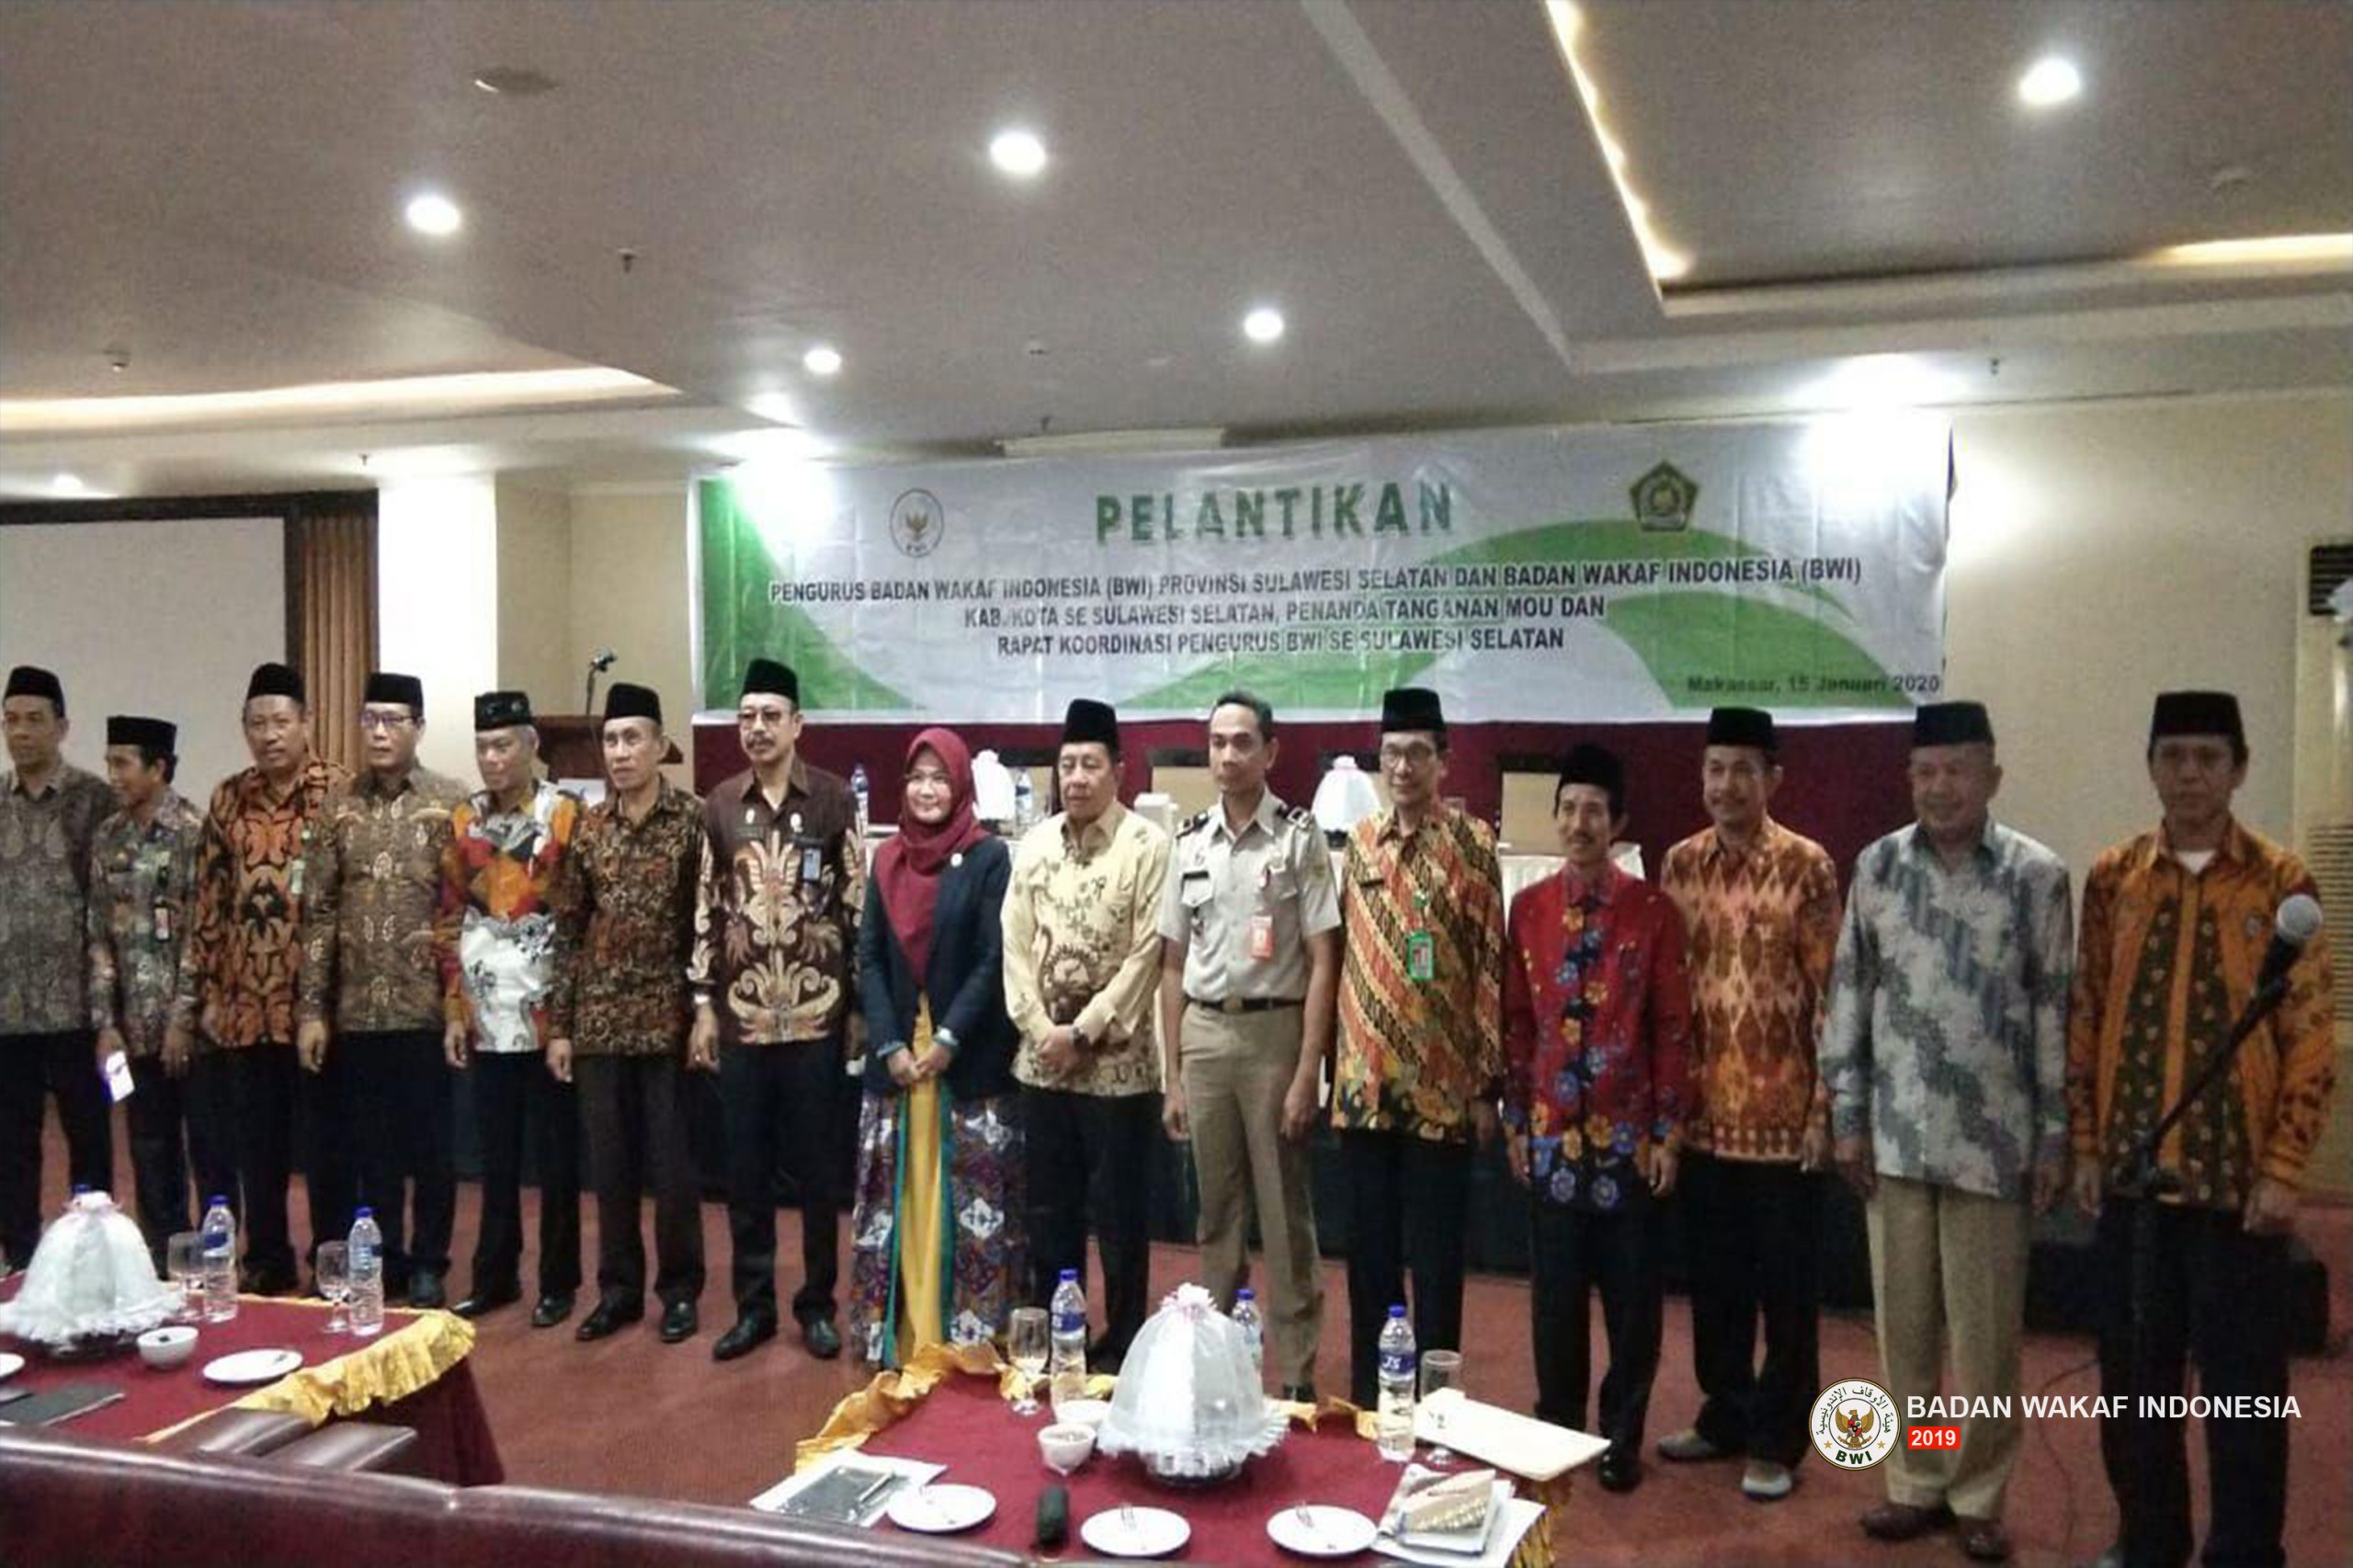 Wakil Ketua BWI Lantik Pengurus Perwakilan Provinsi Sulawesi Selatan Periode 2020-2023  - Wakil Ketua BWI Lantik Pengurus Perwakilan Provinsi Sulawesi Selatan Periode 2020 2023 scaled - Wakil Ketua BWI Lantik Pengurus Perwakilan Provinsi Sulawesi Selatan Periode 2020-2023